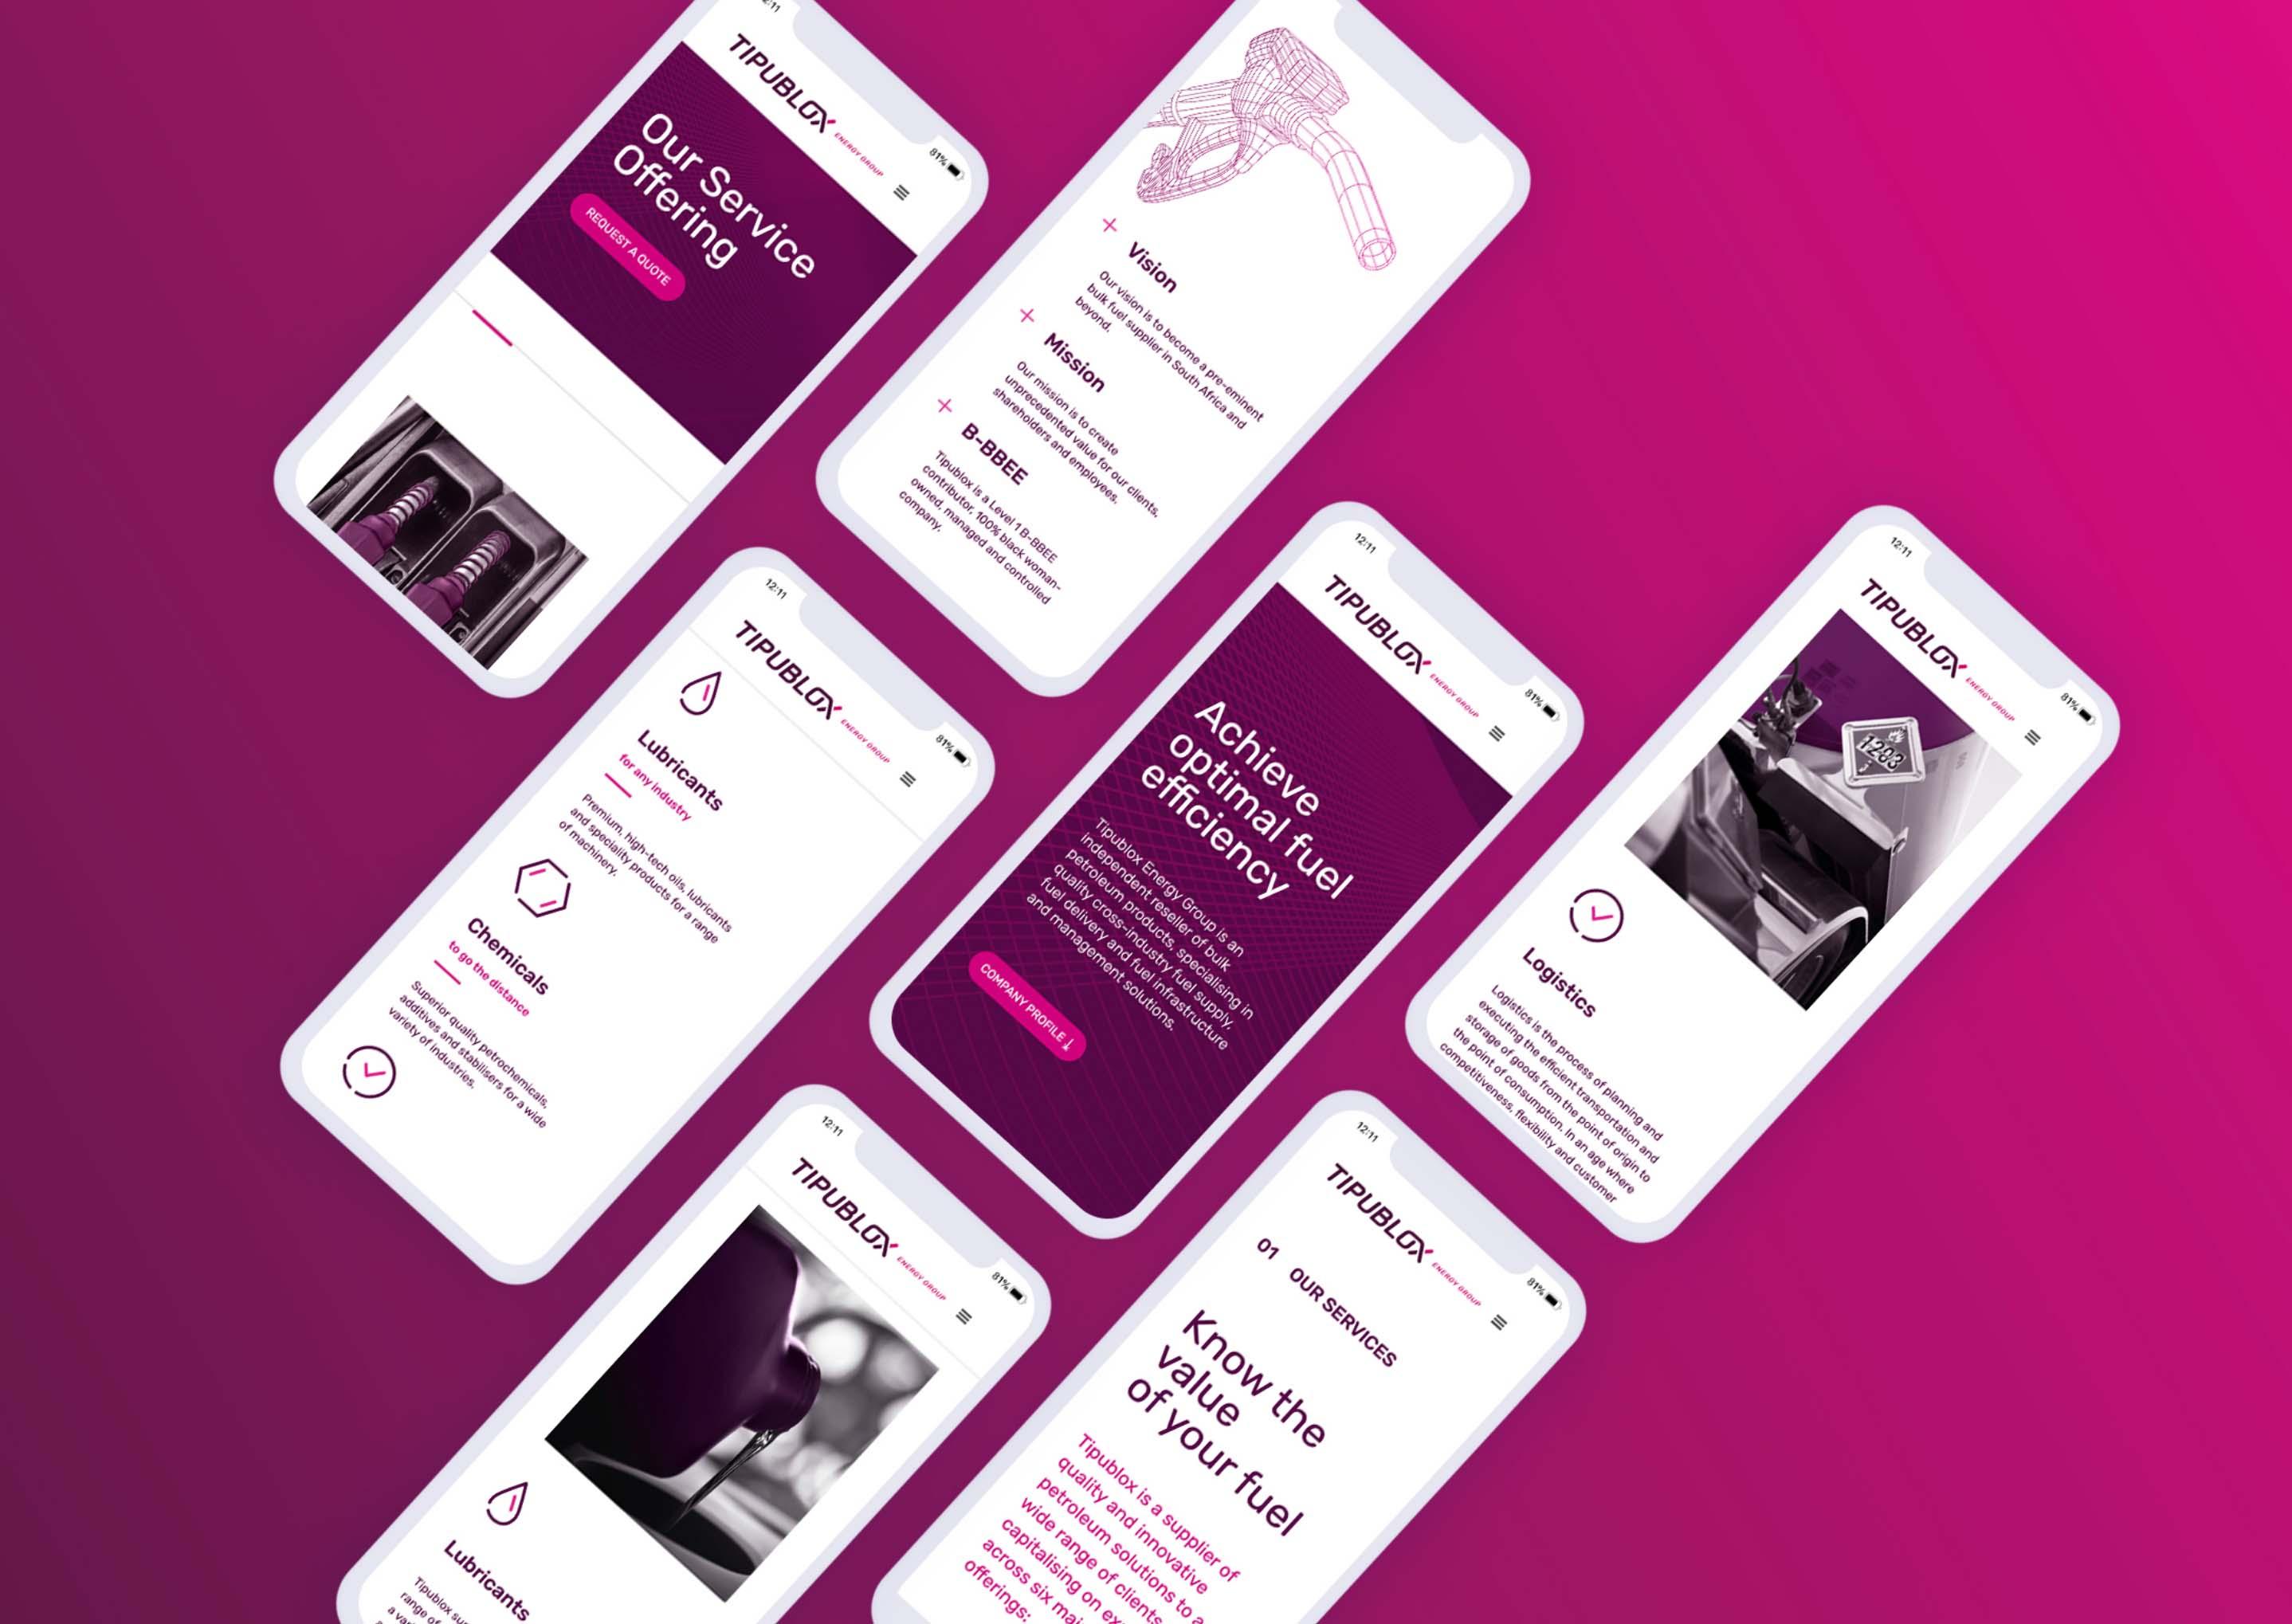 Creative Caterpillar client Tipublox Energy Group mobile website.